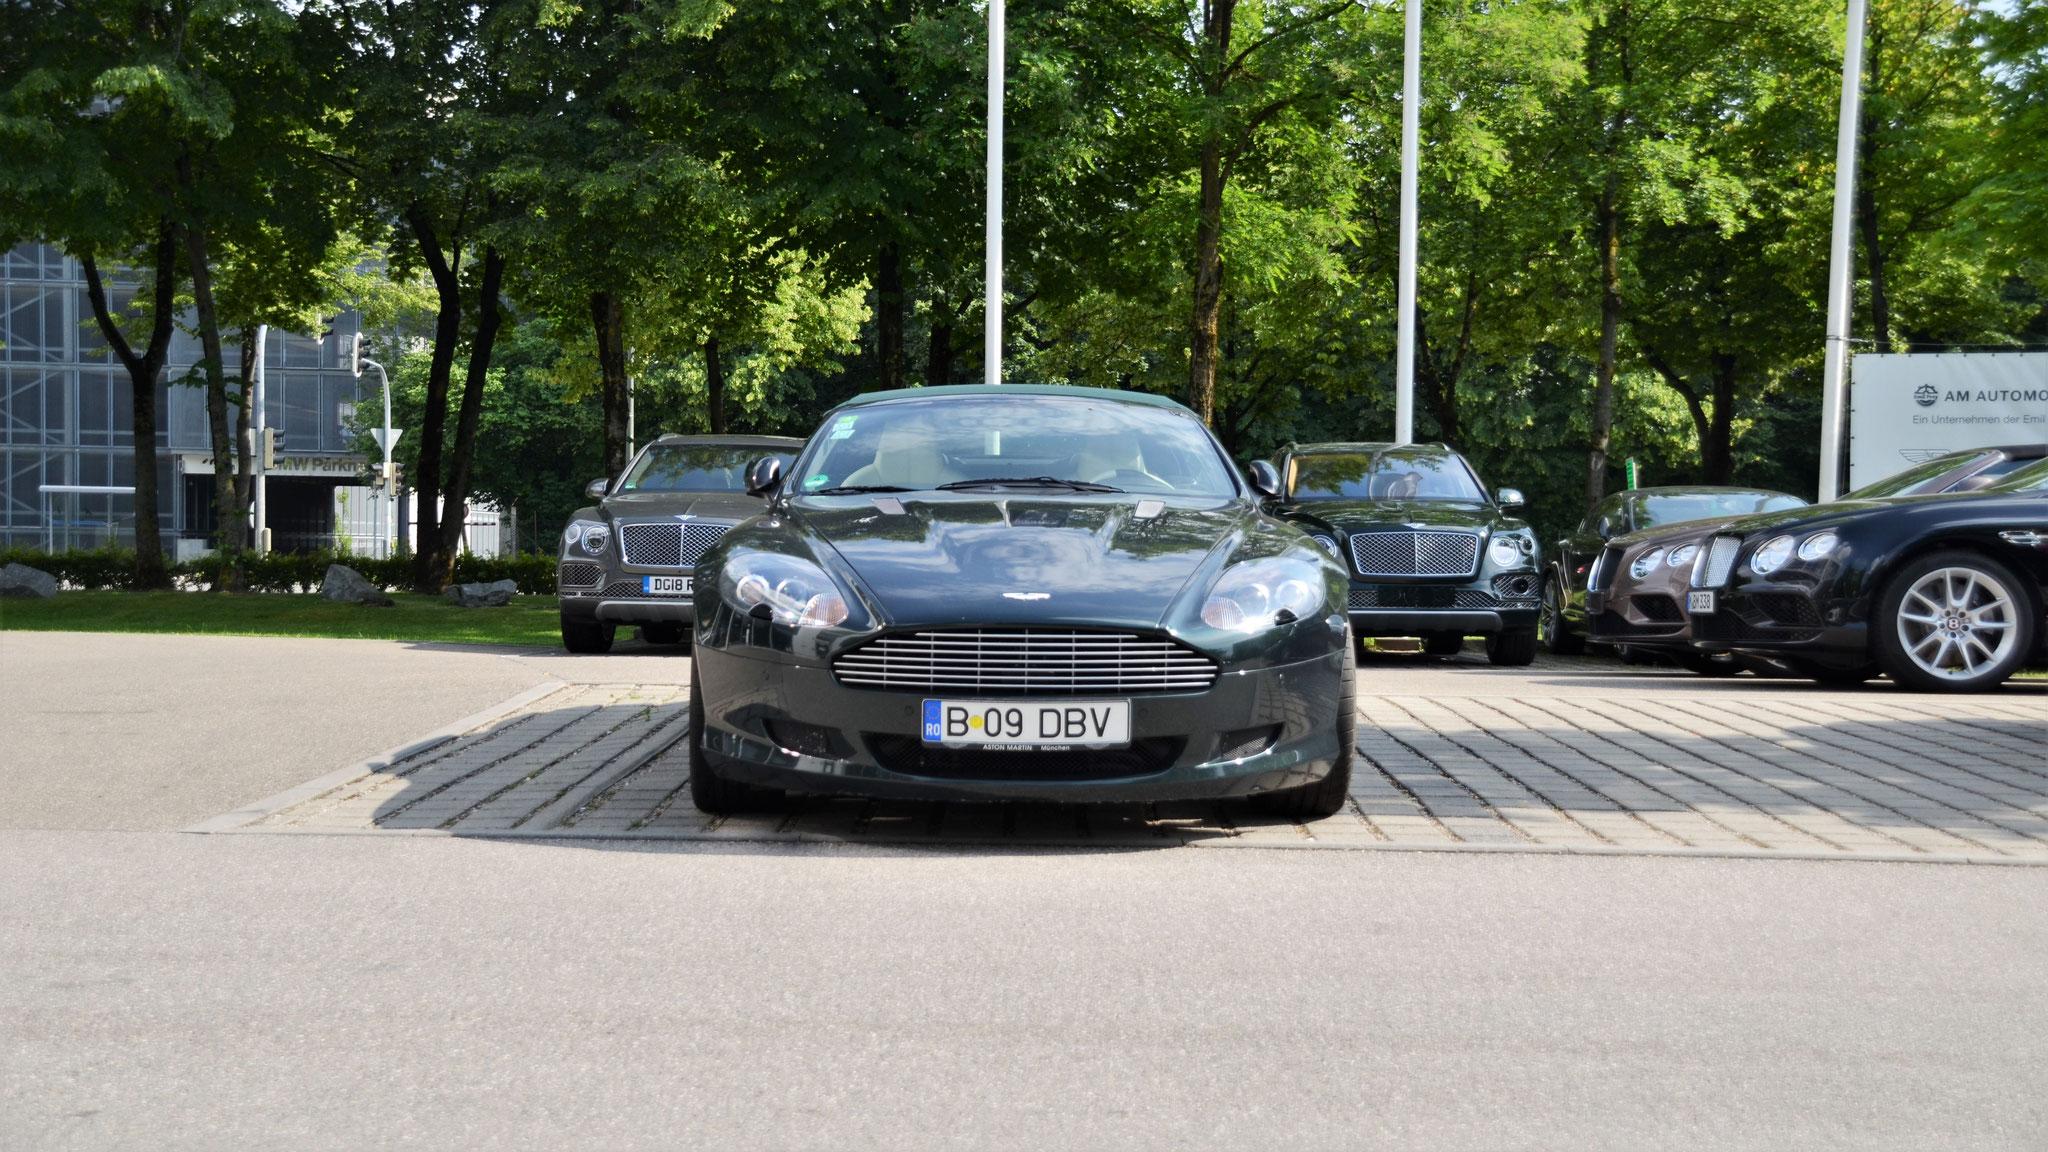 Aston Martin DB9 Volante - B-09-DBV (RO)